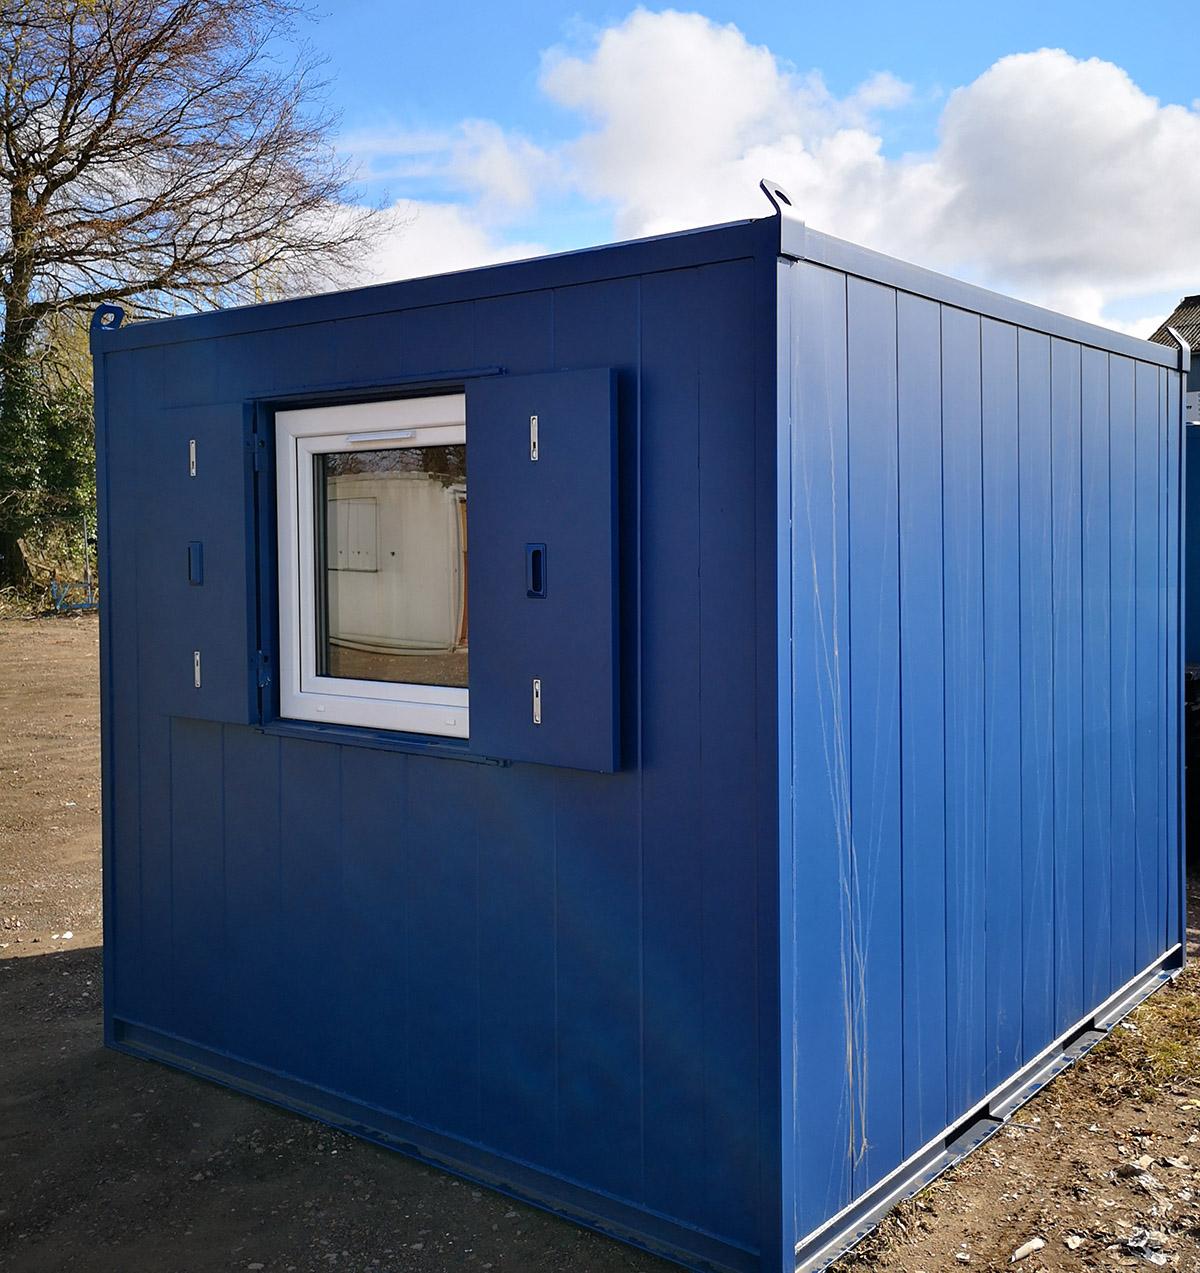 10x9 antivandal office unit with UPVC window